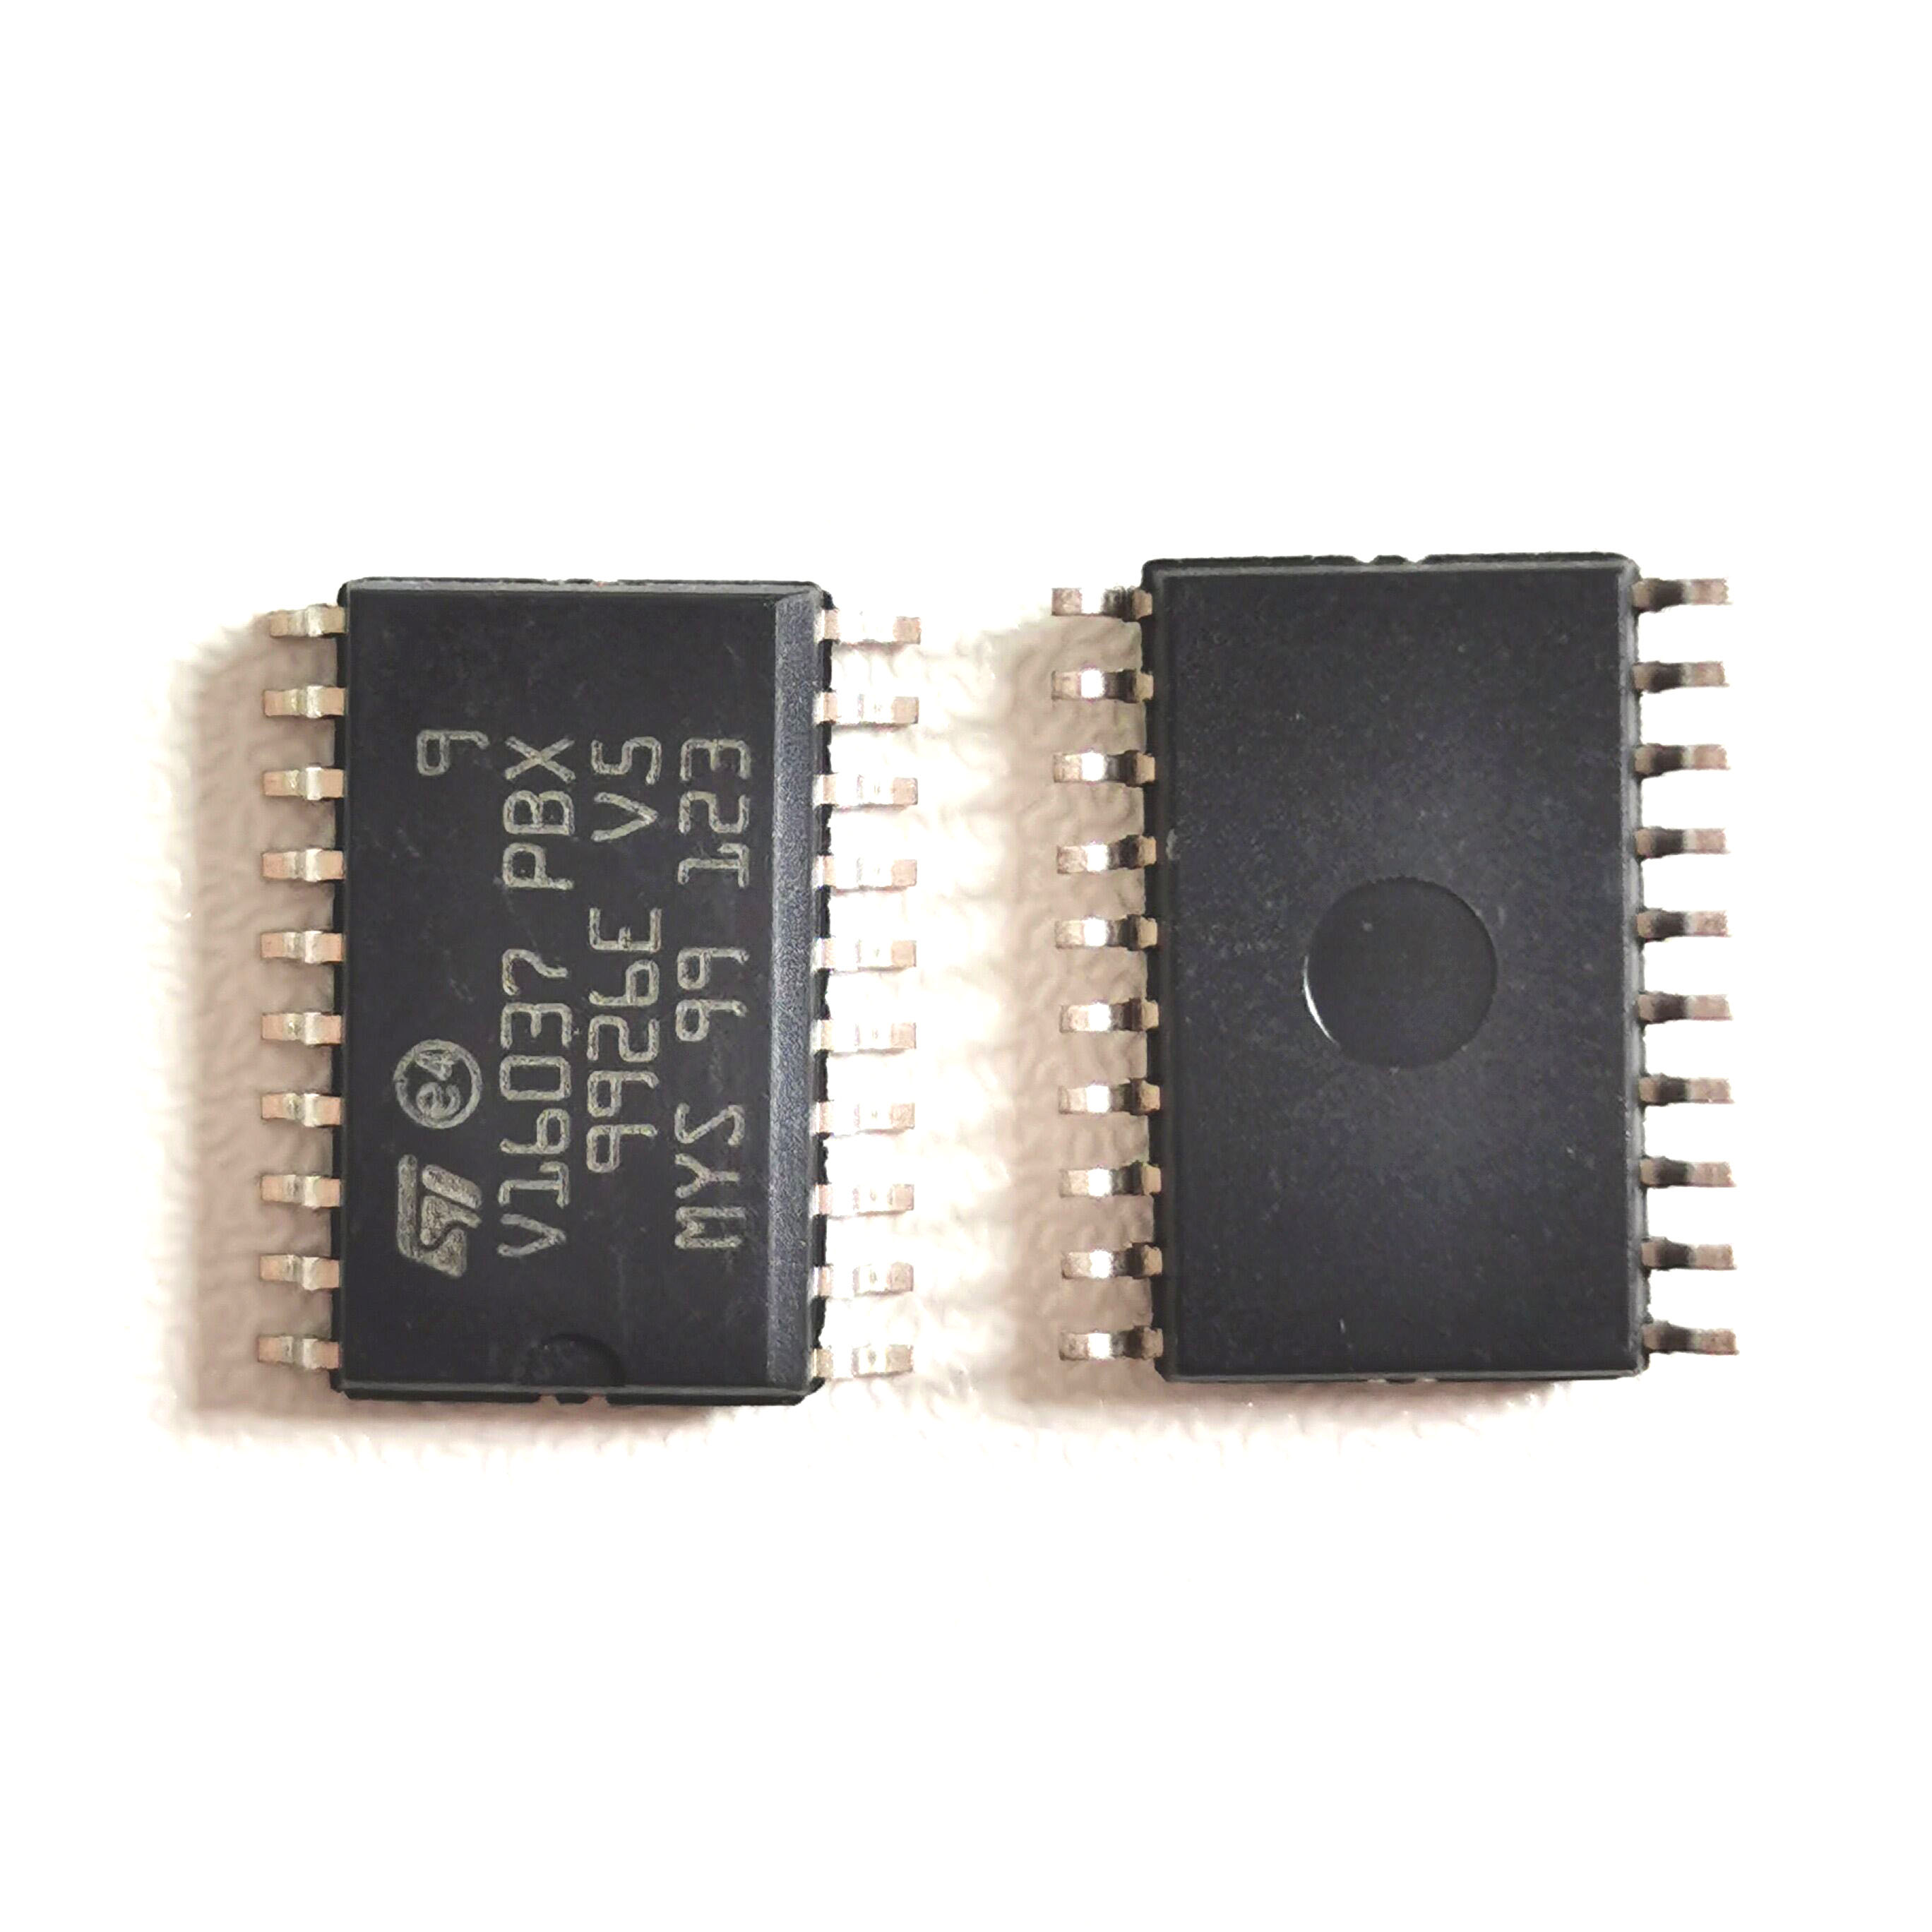 Amplifier IC Chip V16037 for Hyundai Kia Smartra (5pcs)